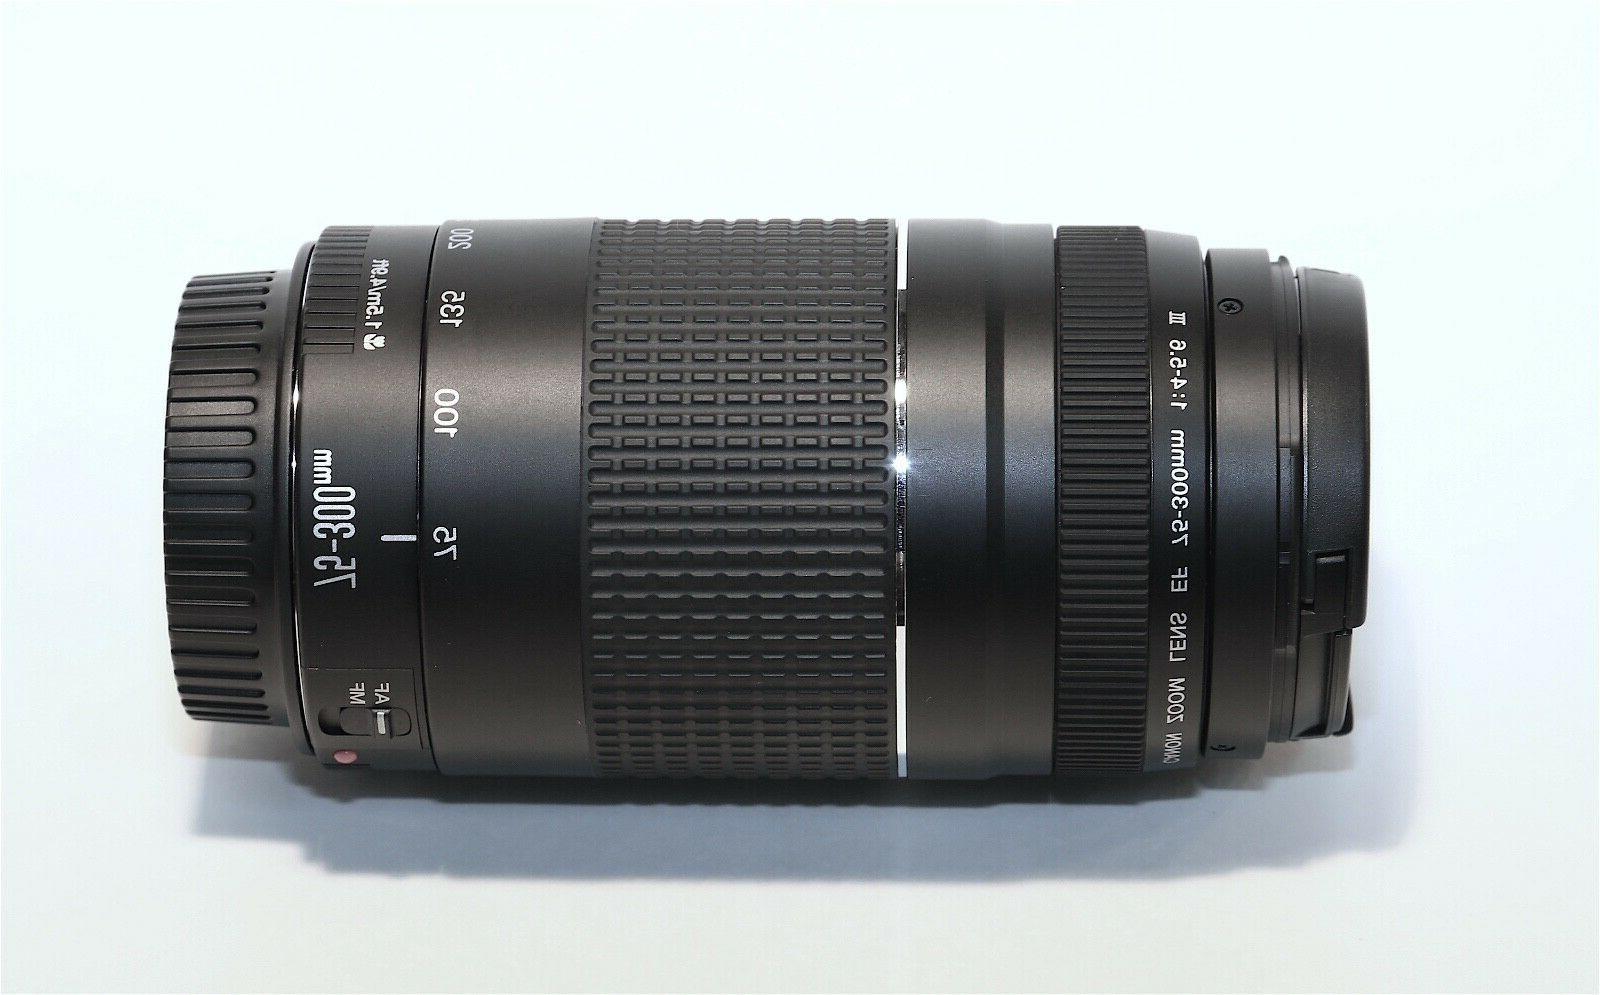 III Telephoto SLR Lens in box